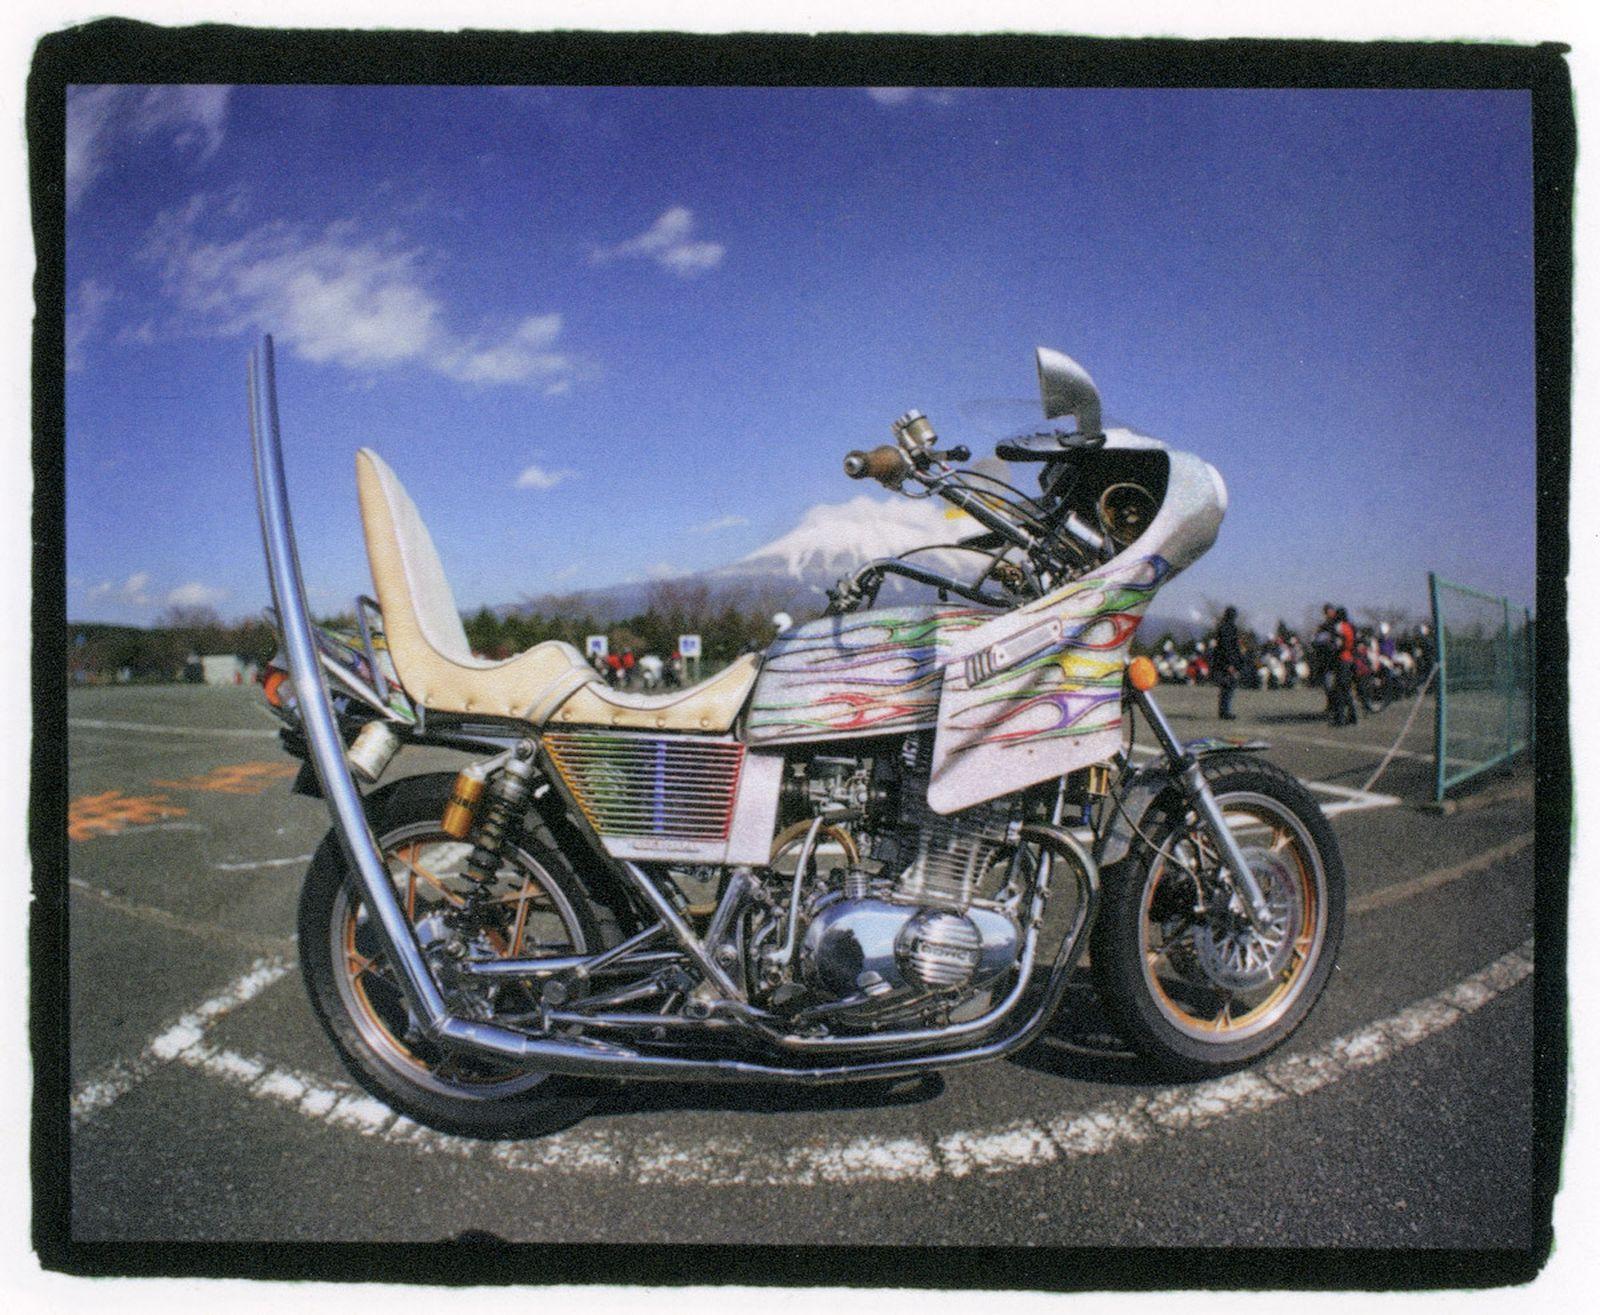 bosozoku-the-stylish-legacy-of-japans-rebel-motorcycle-gangs-7